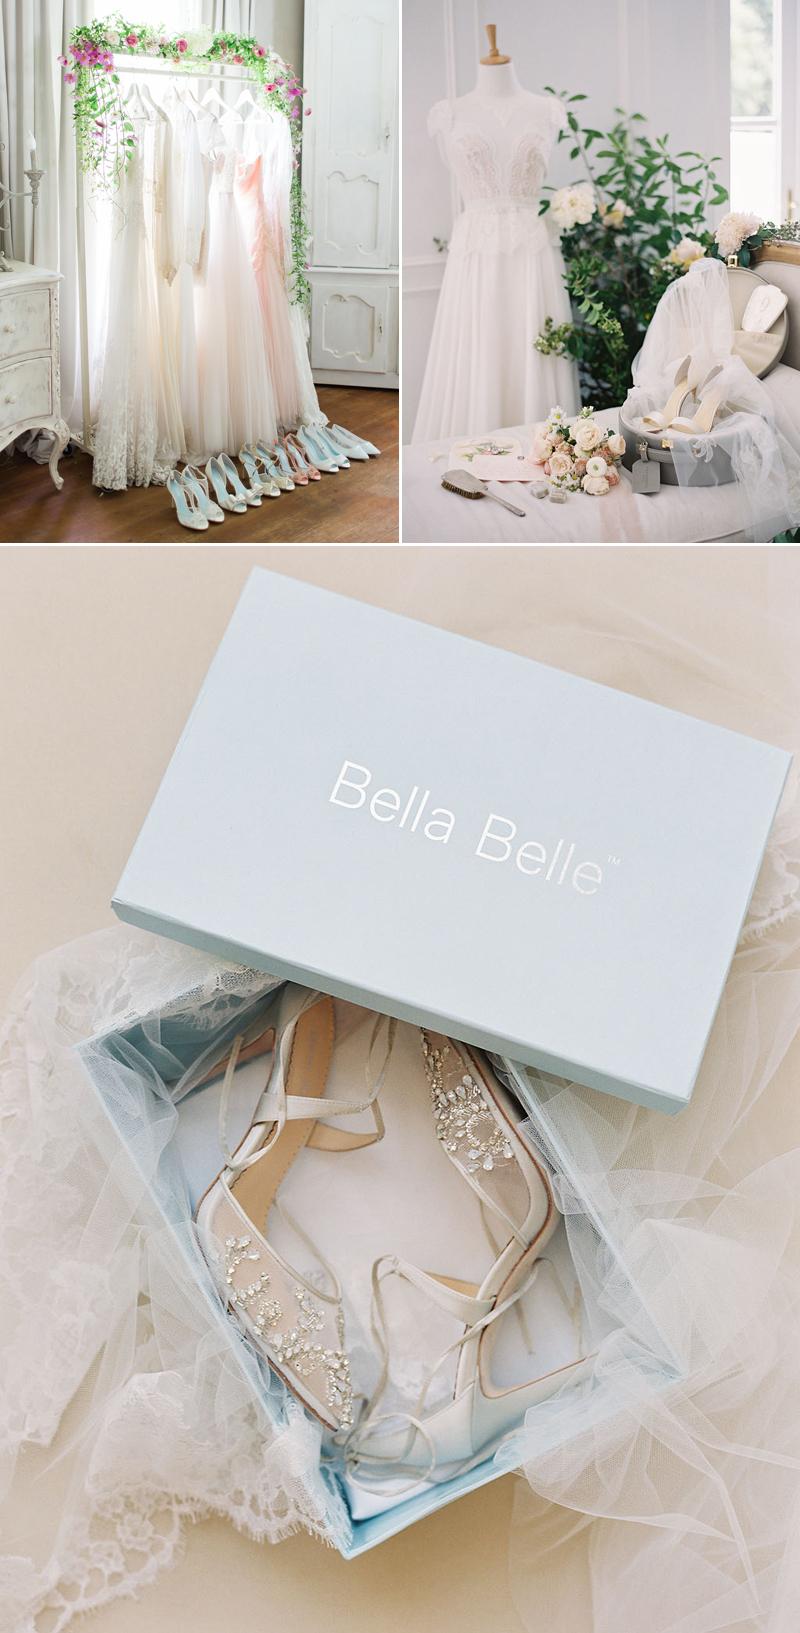 bellabelle05